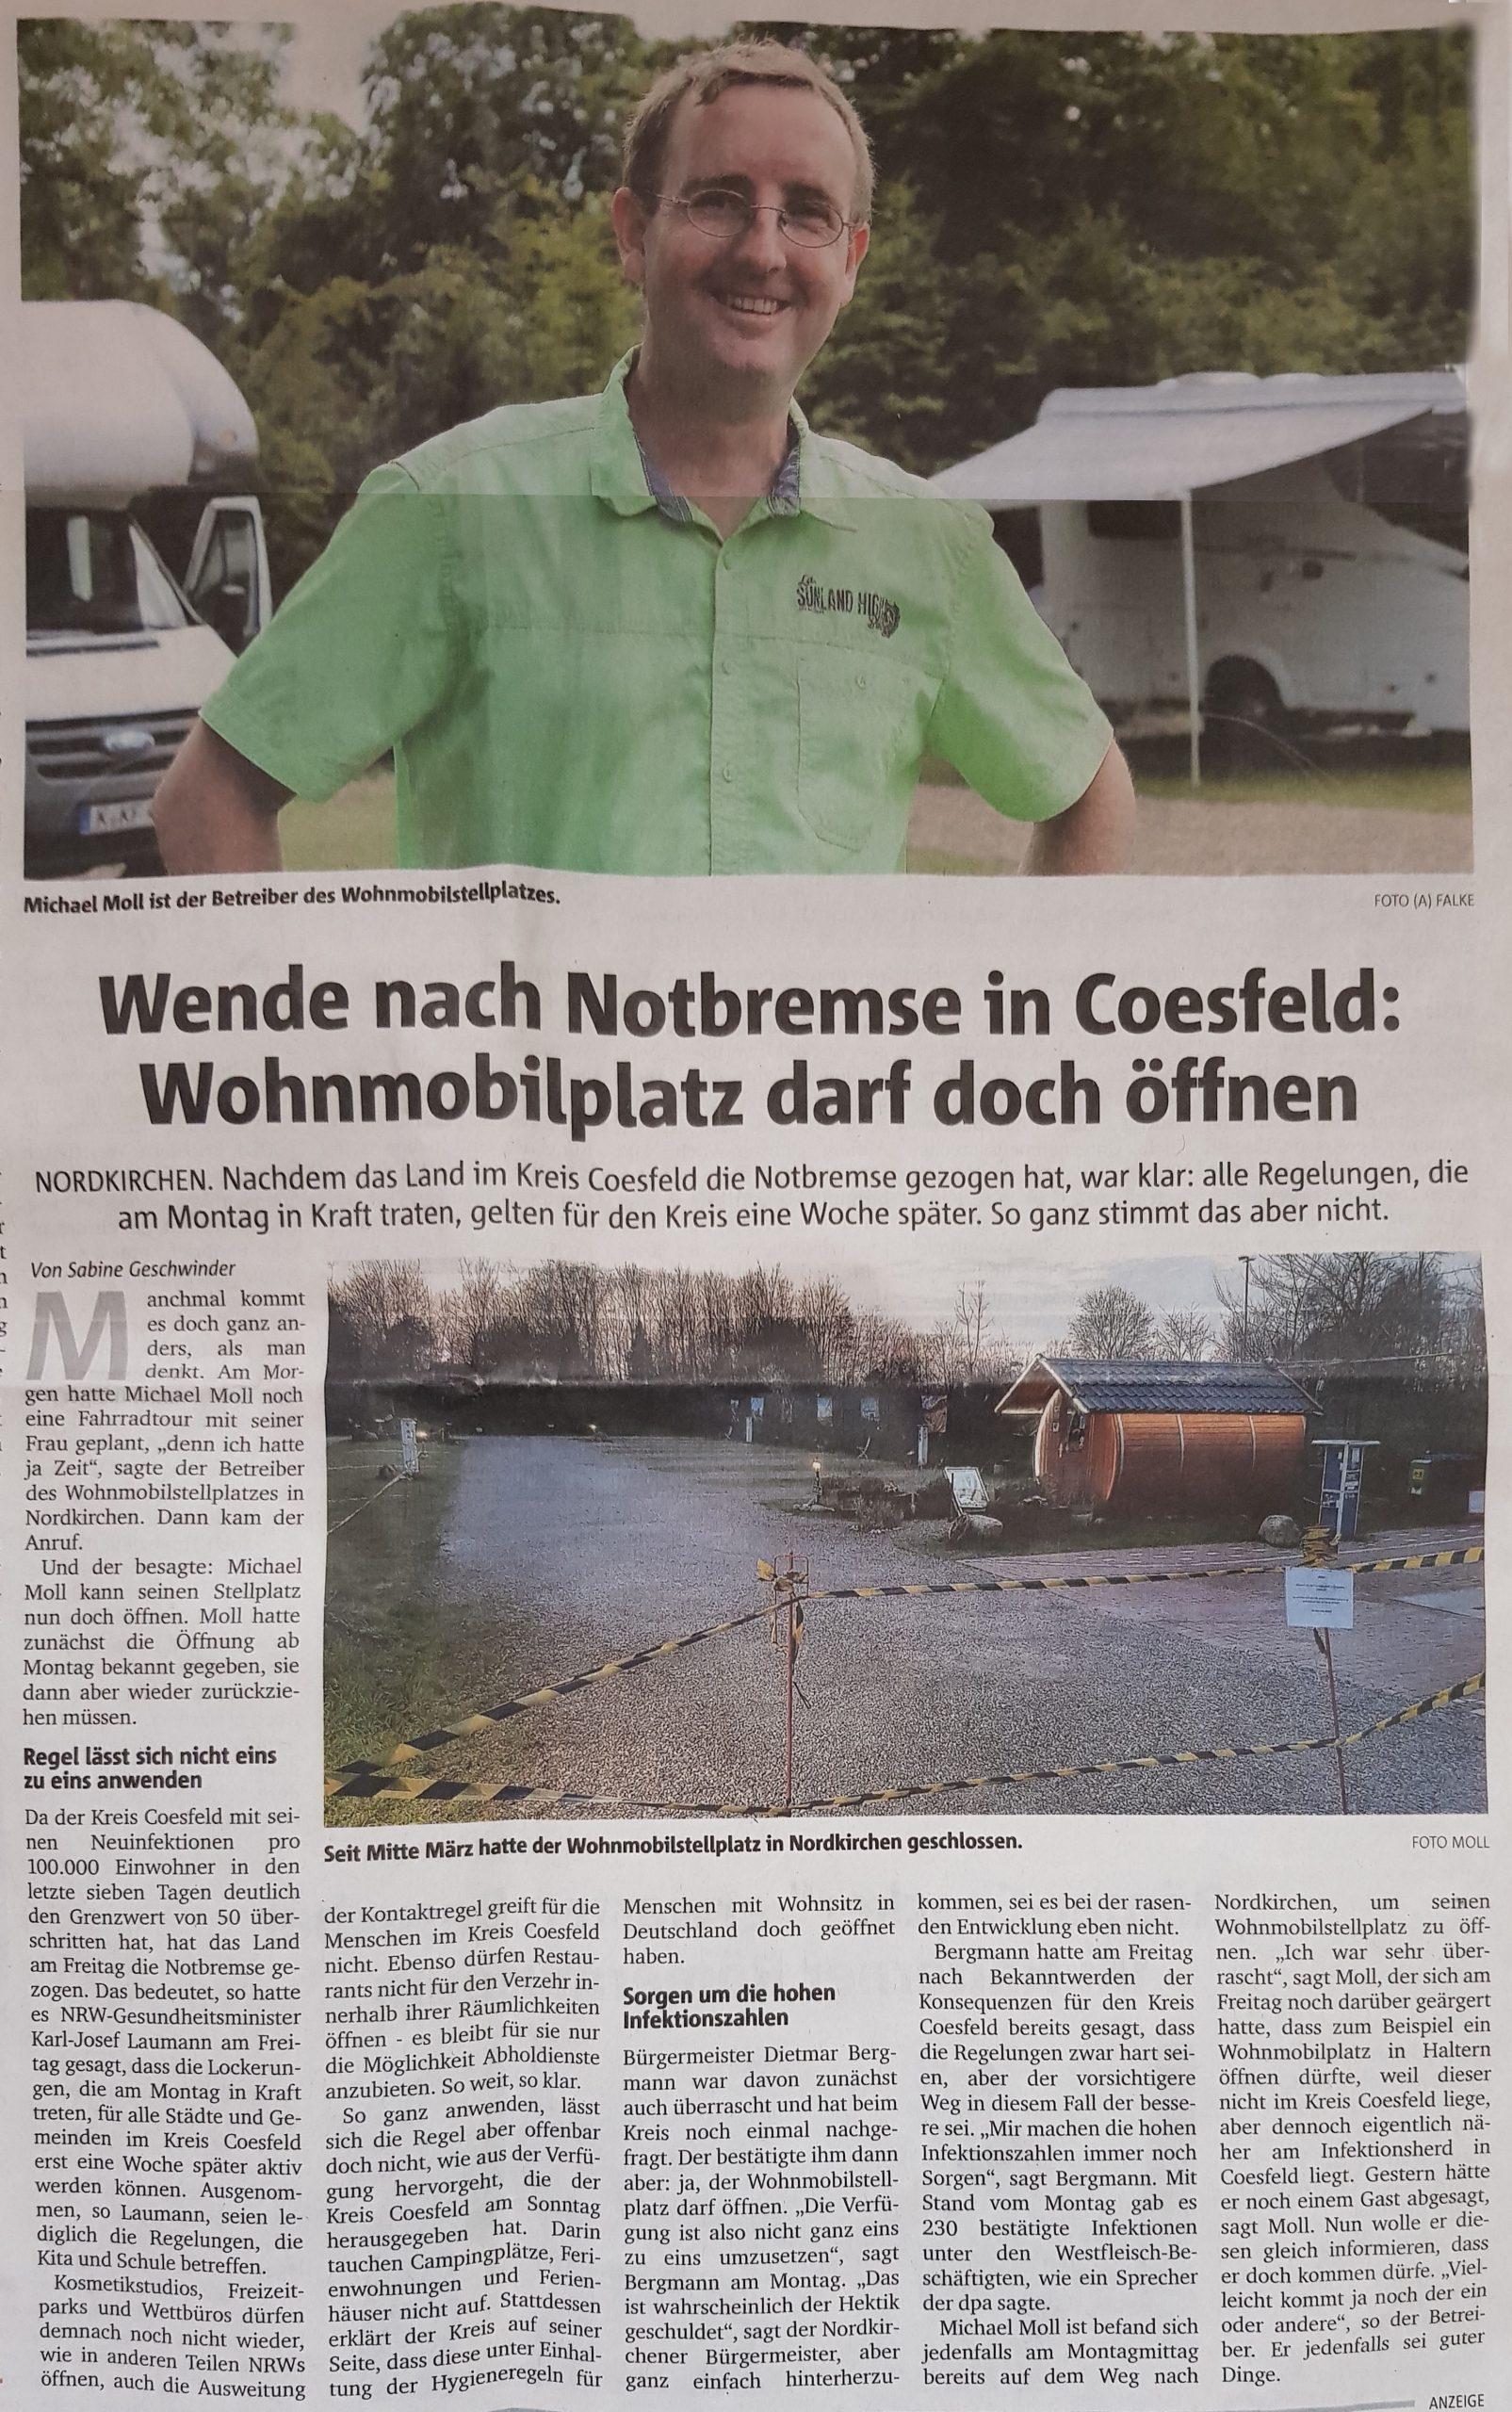 2020-05-12 Ruhrnachrichten-Print